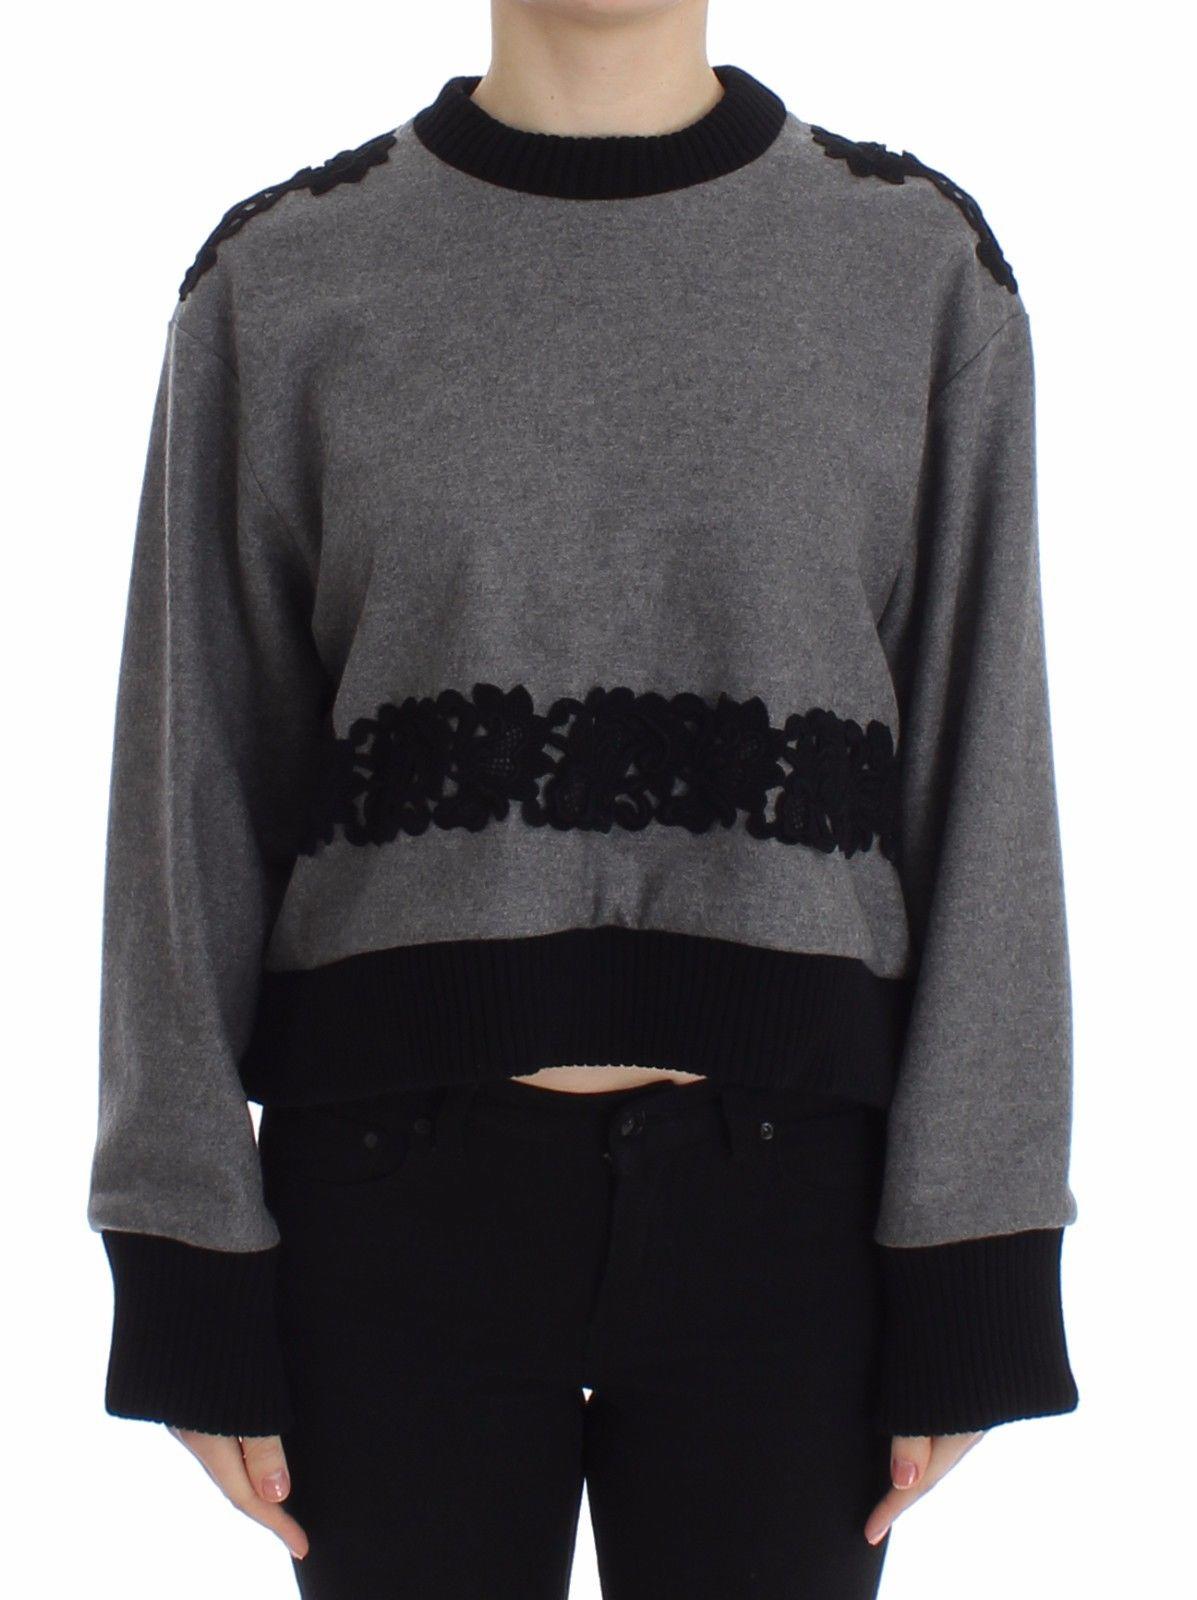 Dolce & Gabbana Women's Lace Wool Cashmere Sweater Gray SIG13181 - IT44 L